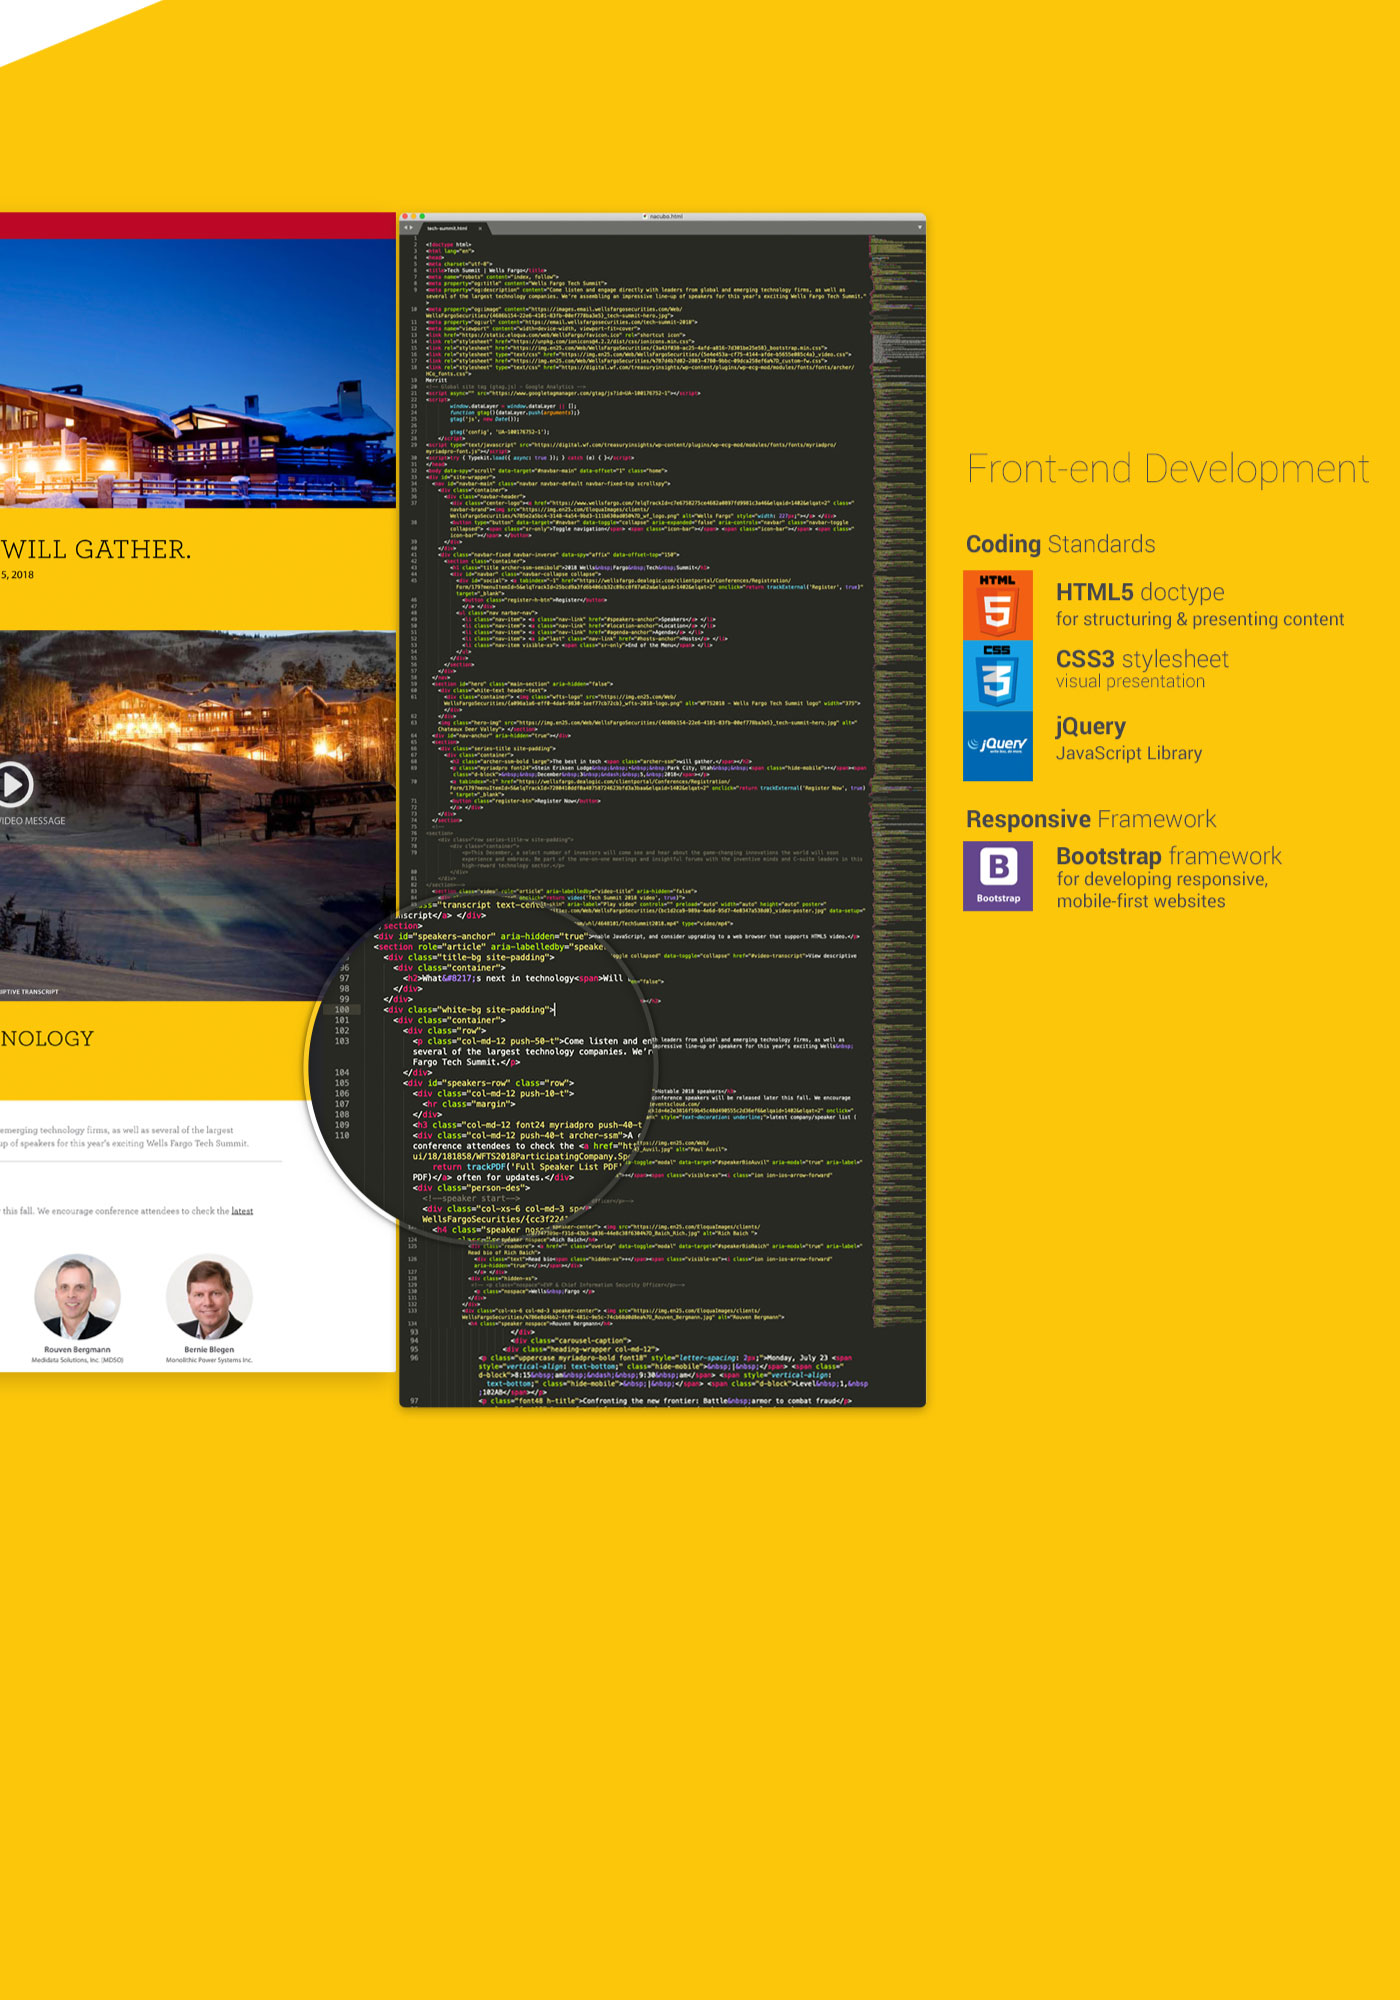 Wells Fargo Tech Summit website backend code displaying hierarchy